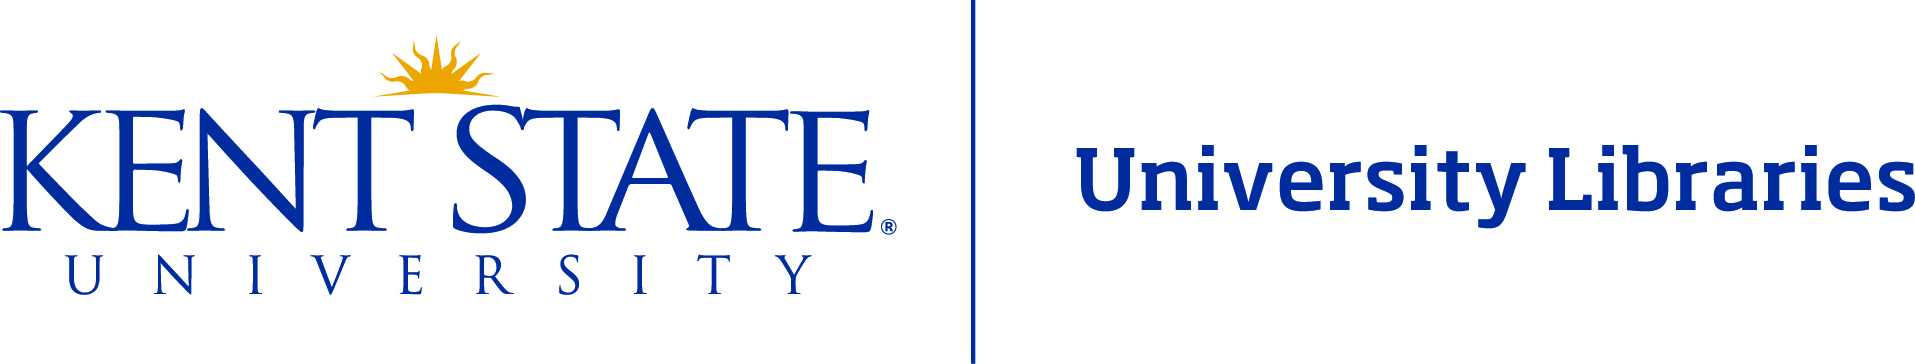 Kent State University Libraries | Drupal org